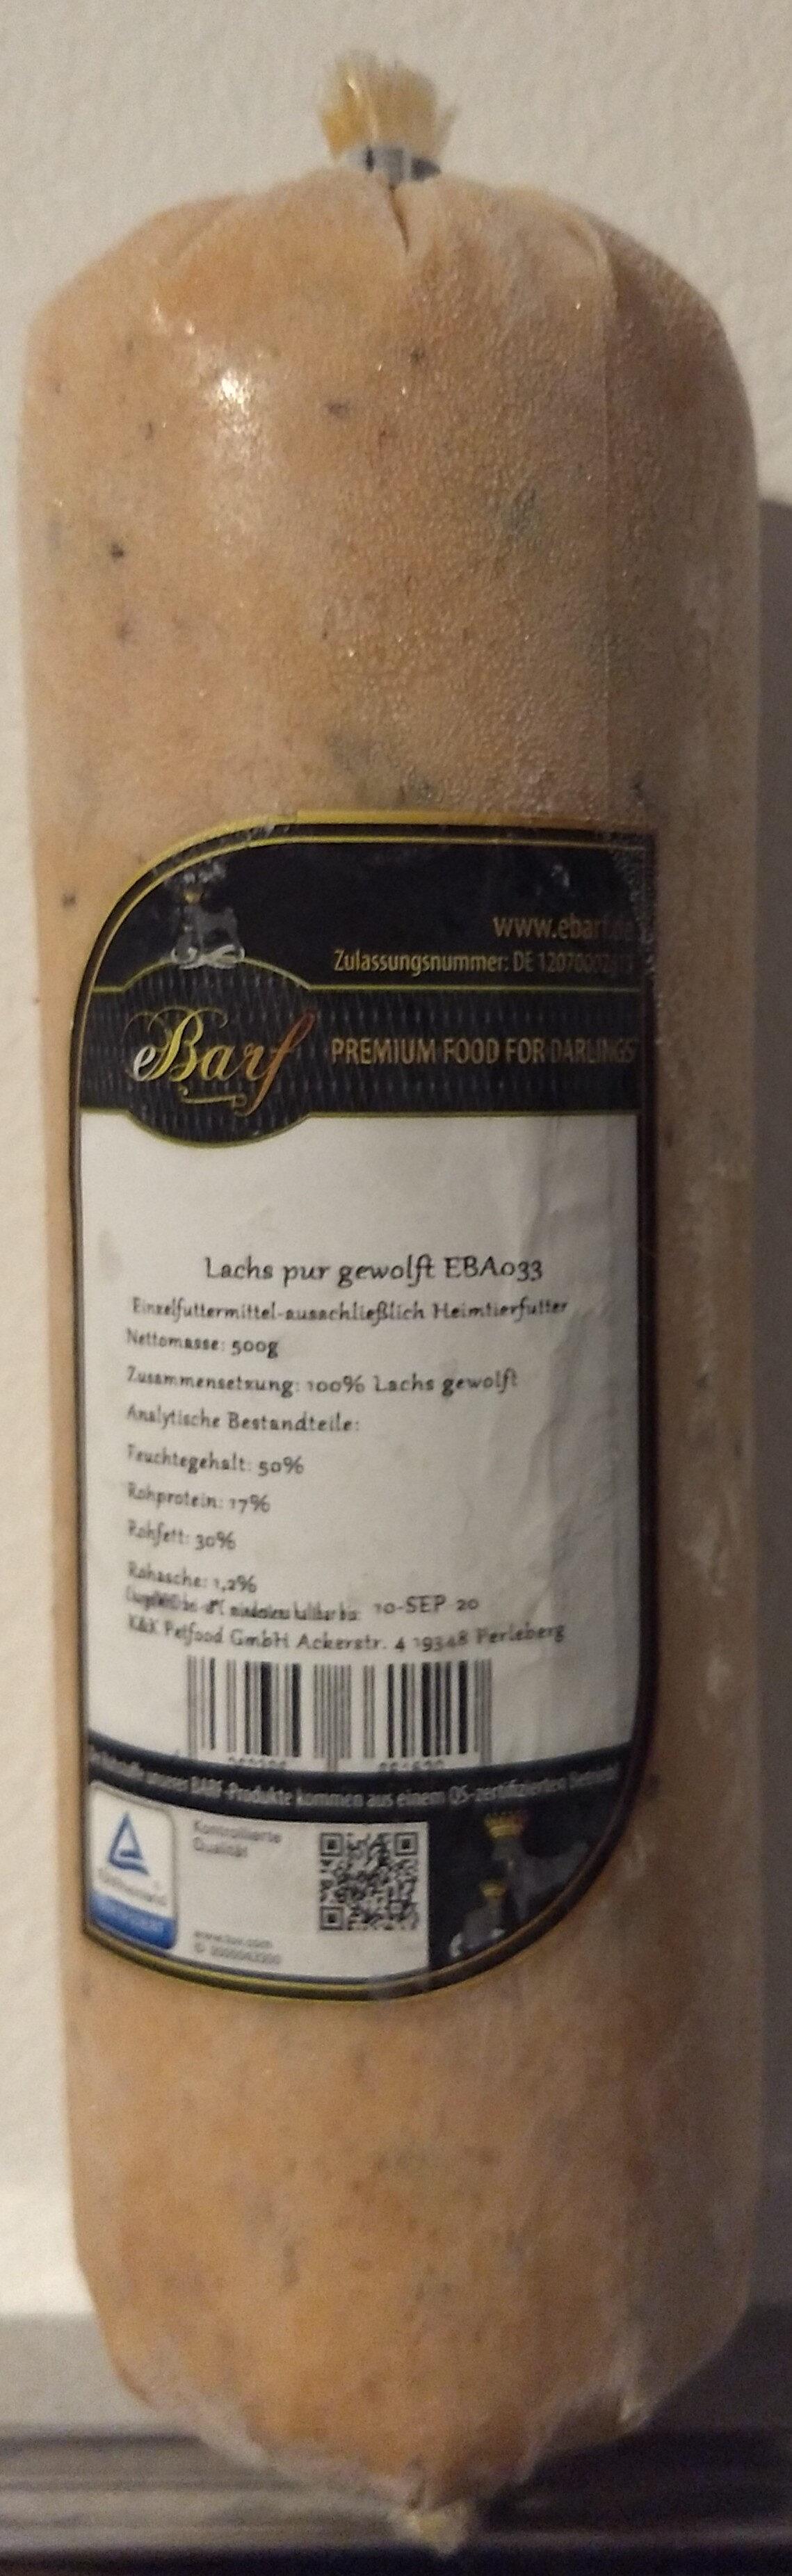 Lachs pur gewolft EBA033 - Product